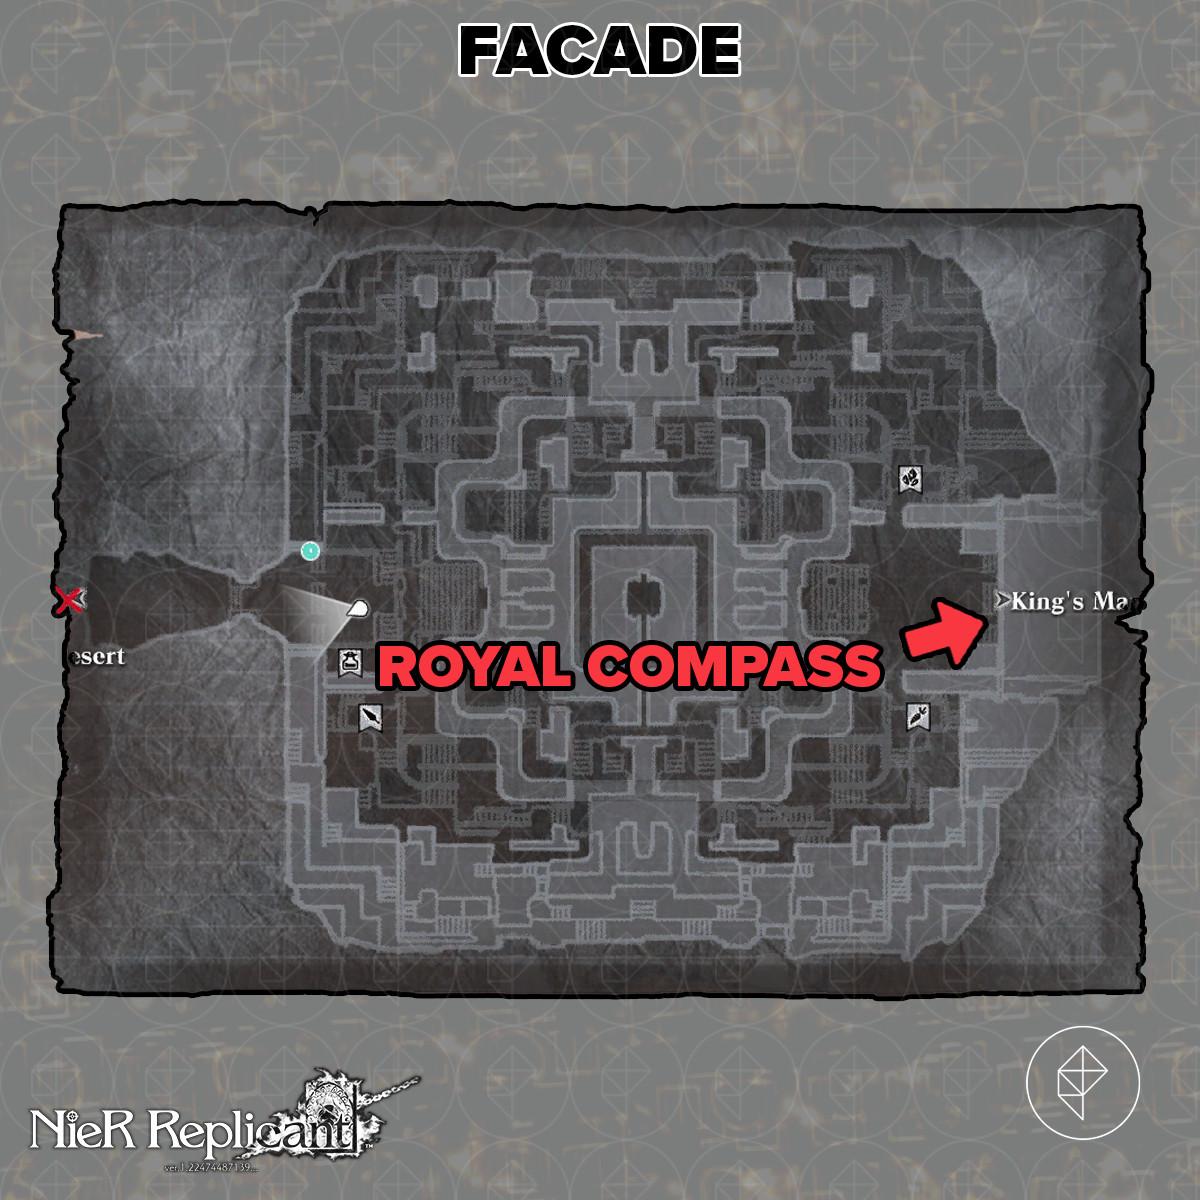 Nier Replicant Royal Compass